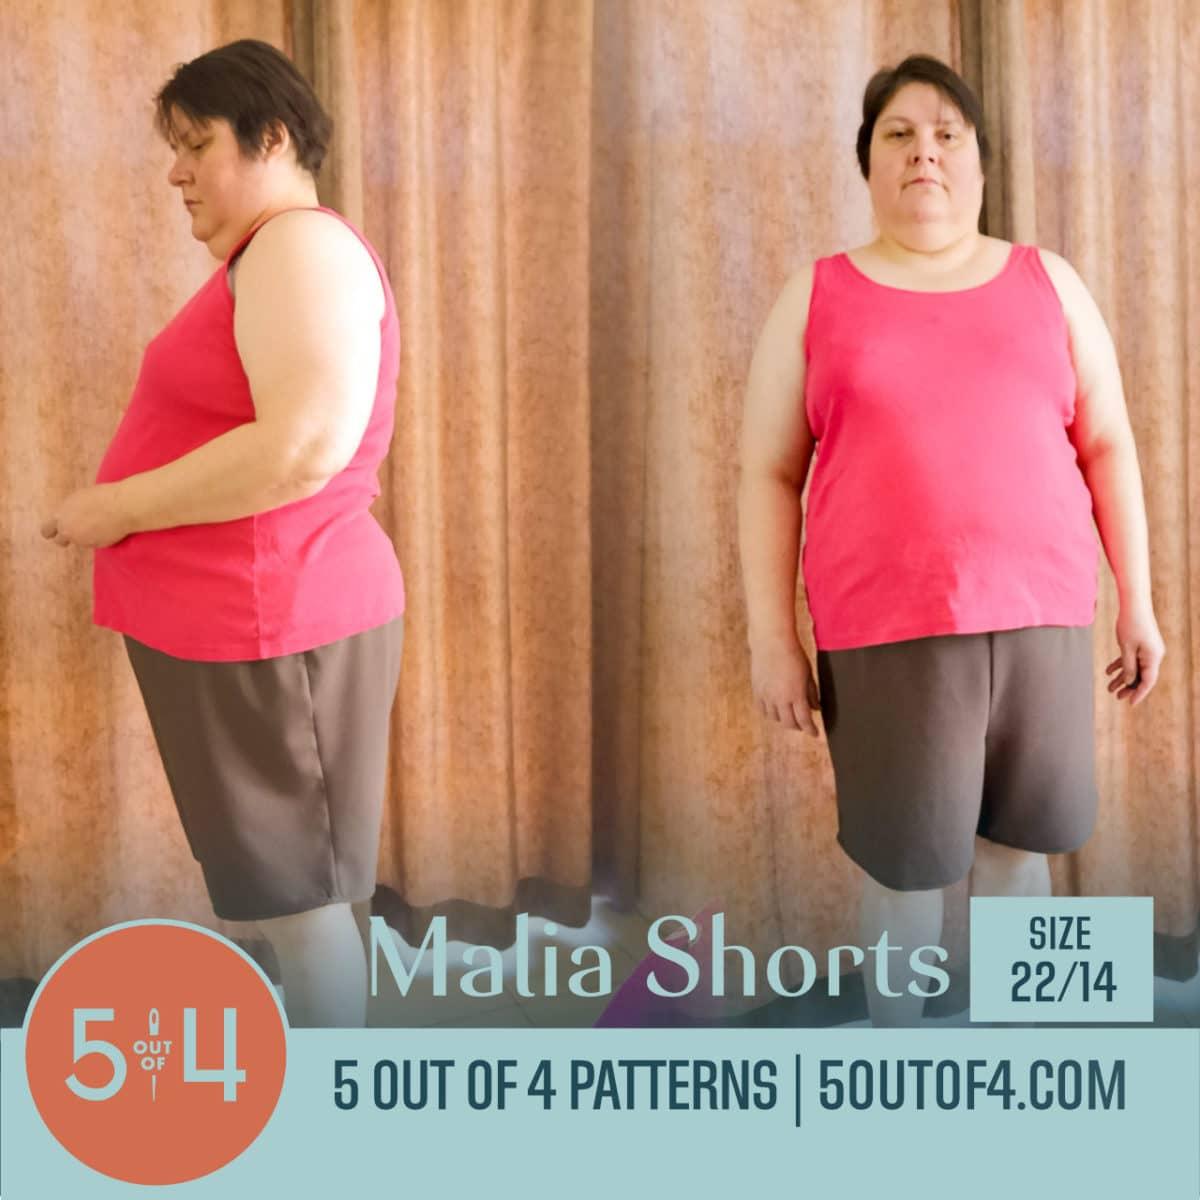 Malia Shorts Size 22:14